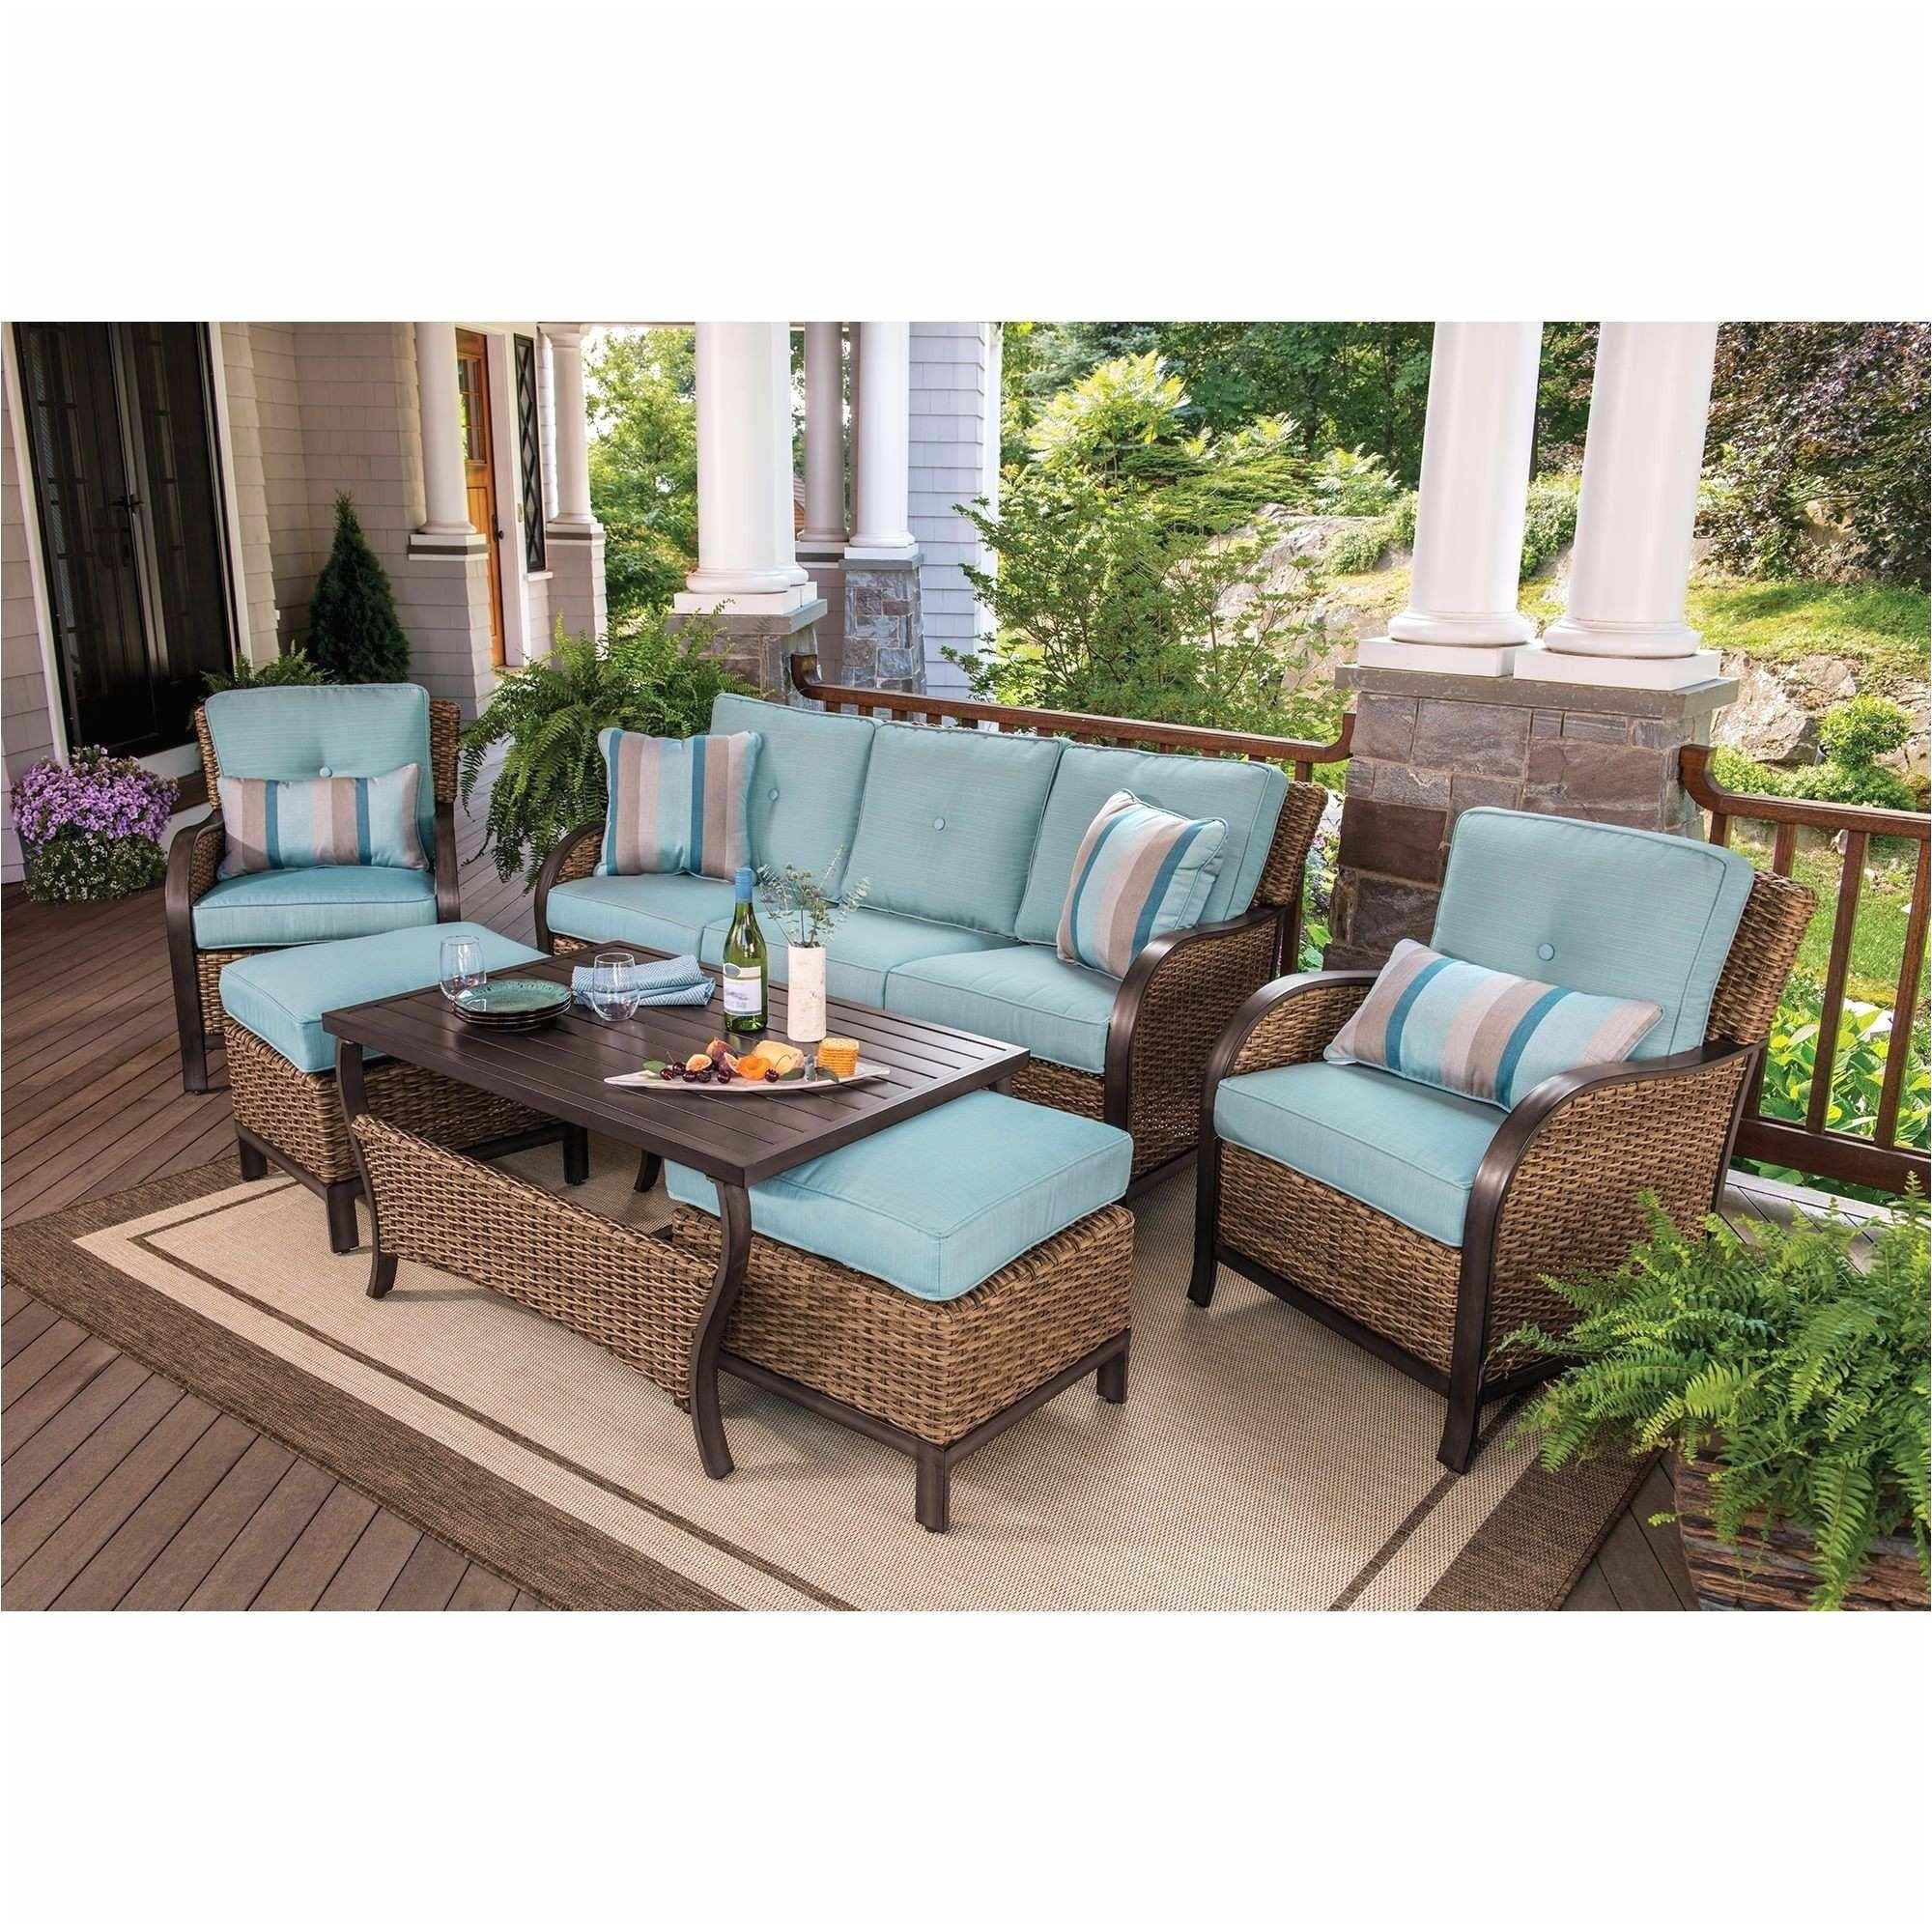 30 fresh outdoor furniture wilmington nc ideas jsmorganicsfarm